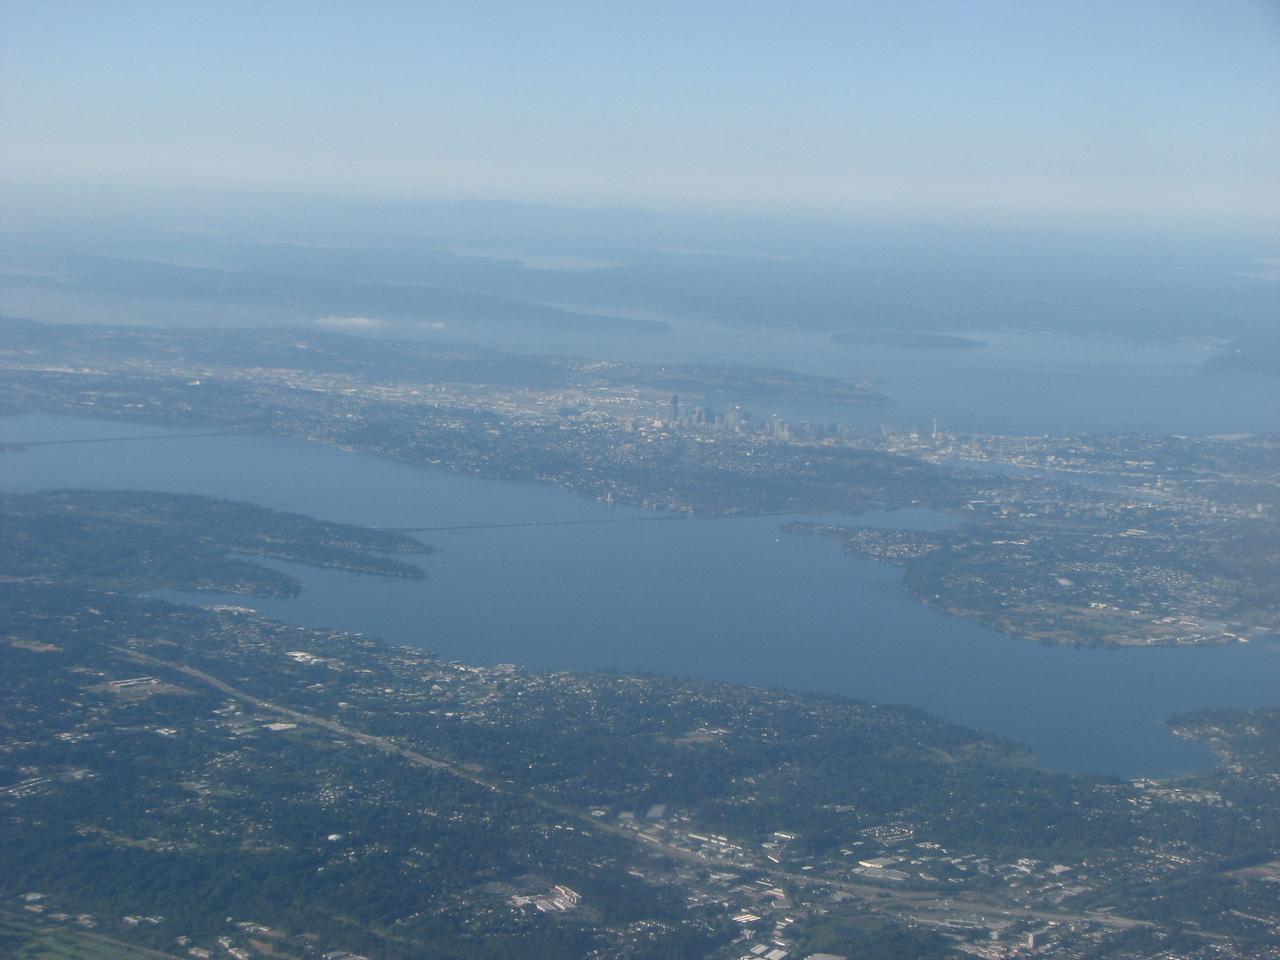 Lake Washington on our approach.